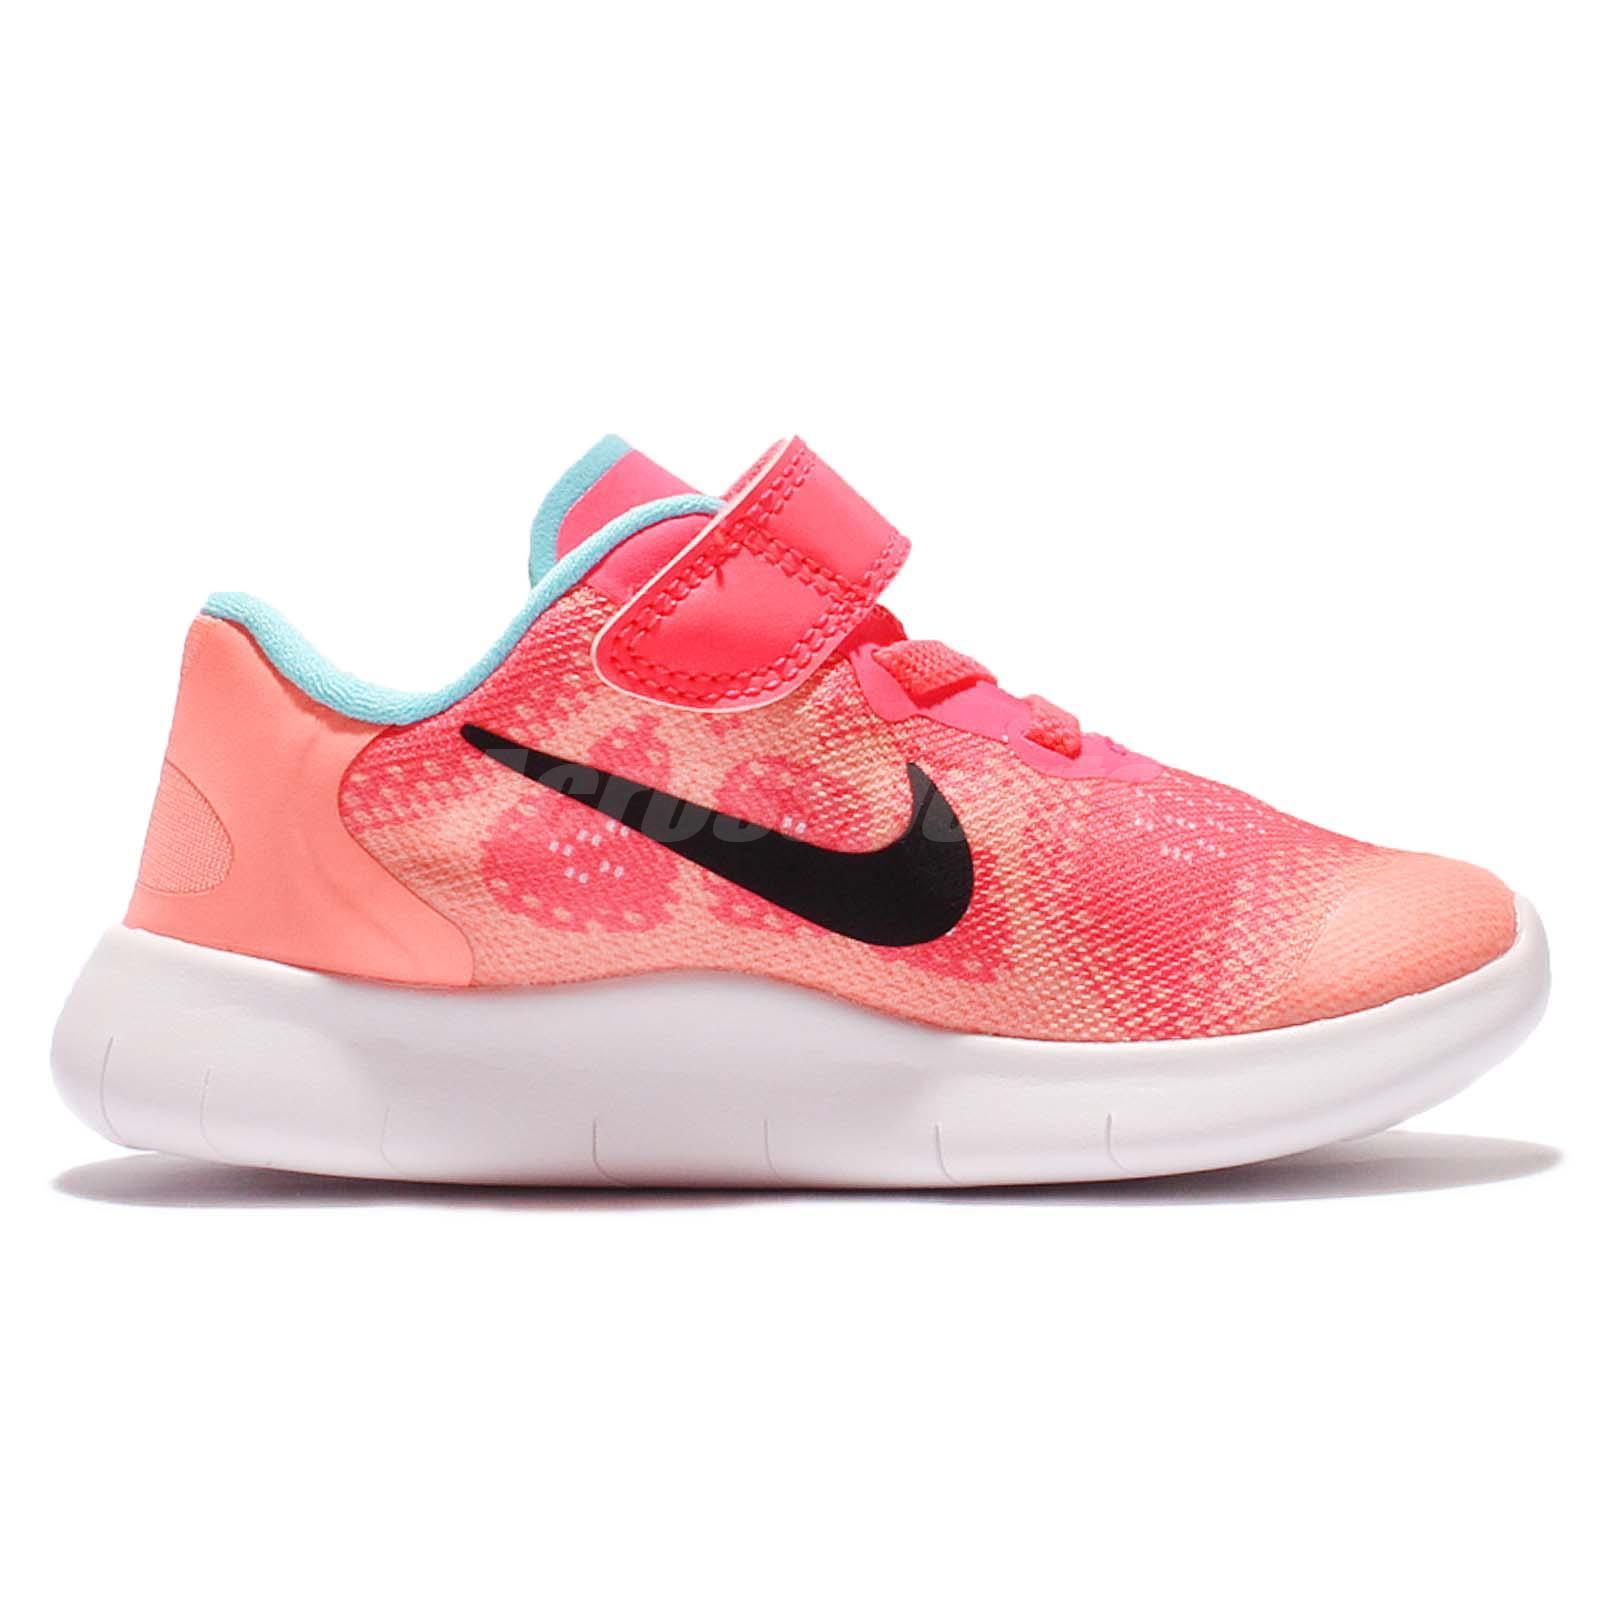 timeless design aab66 b6da4 Nike Free RN 2017 TDV Run Racer Pink Toddler Baby Running Shoes 904261-600  | PrestoMall - Accessories